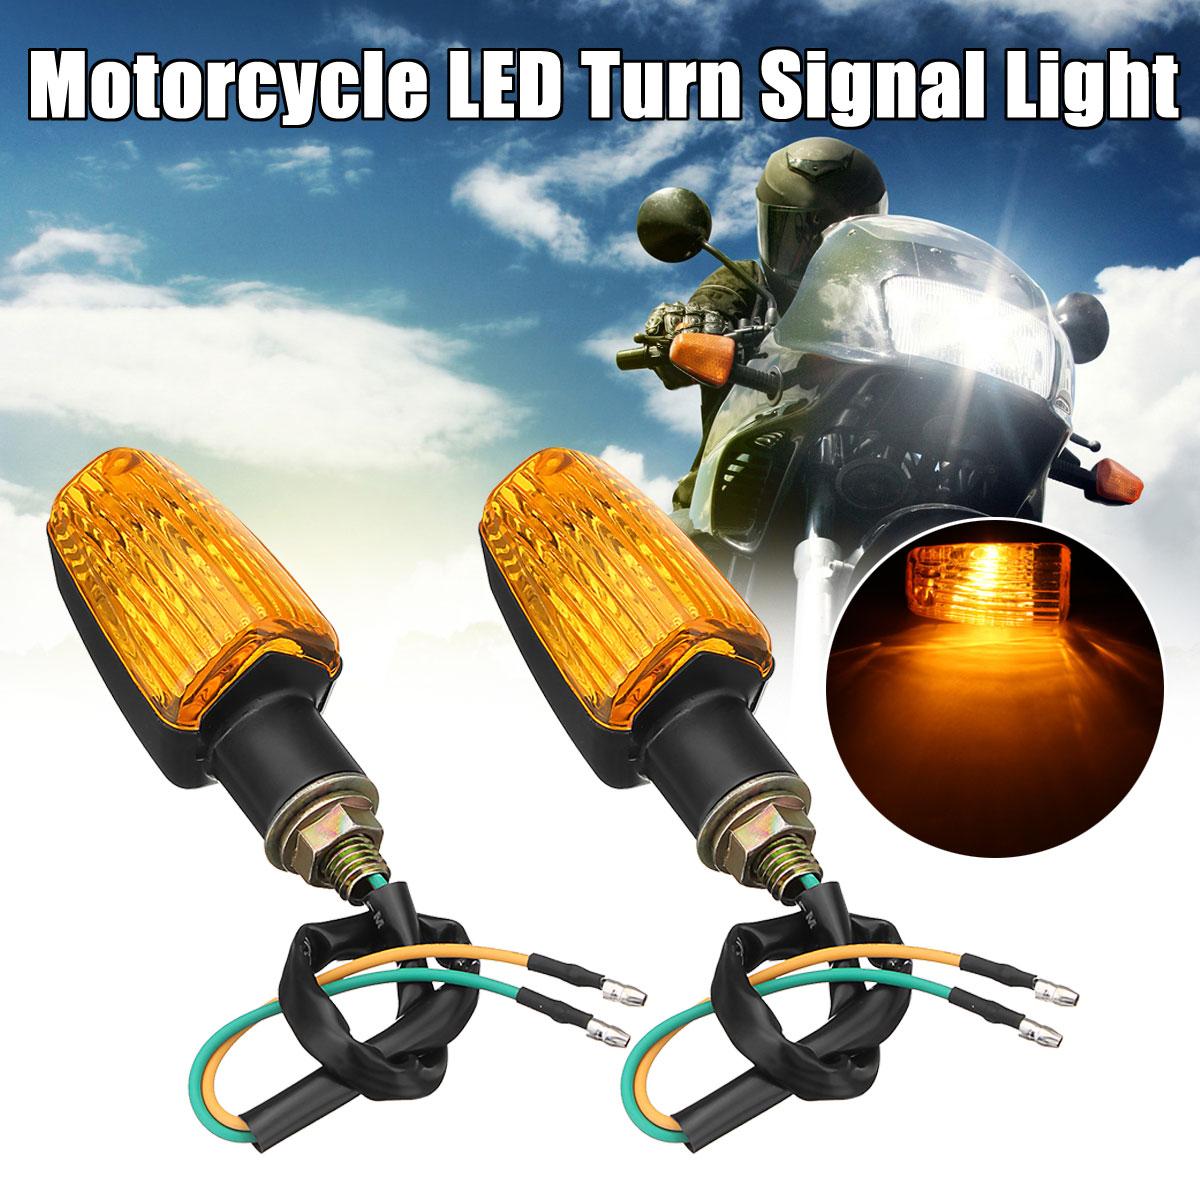 2PCS For Honda For Suzuki For Yamaha For Kawasaki Universal Motorcycle Plastic Turn Signal Indicator Light DC 12V Amber Lens